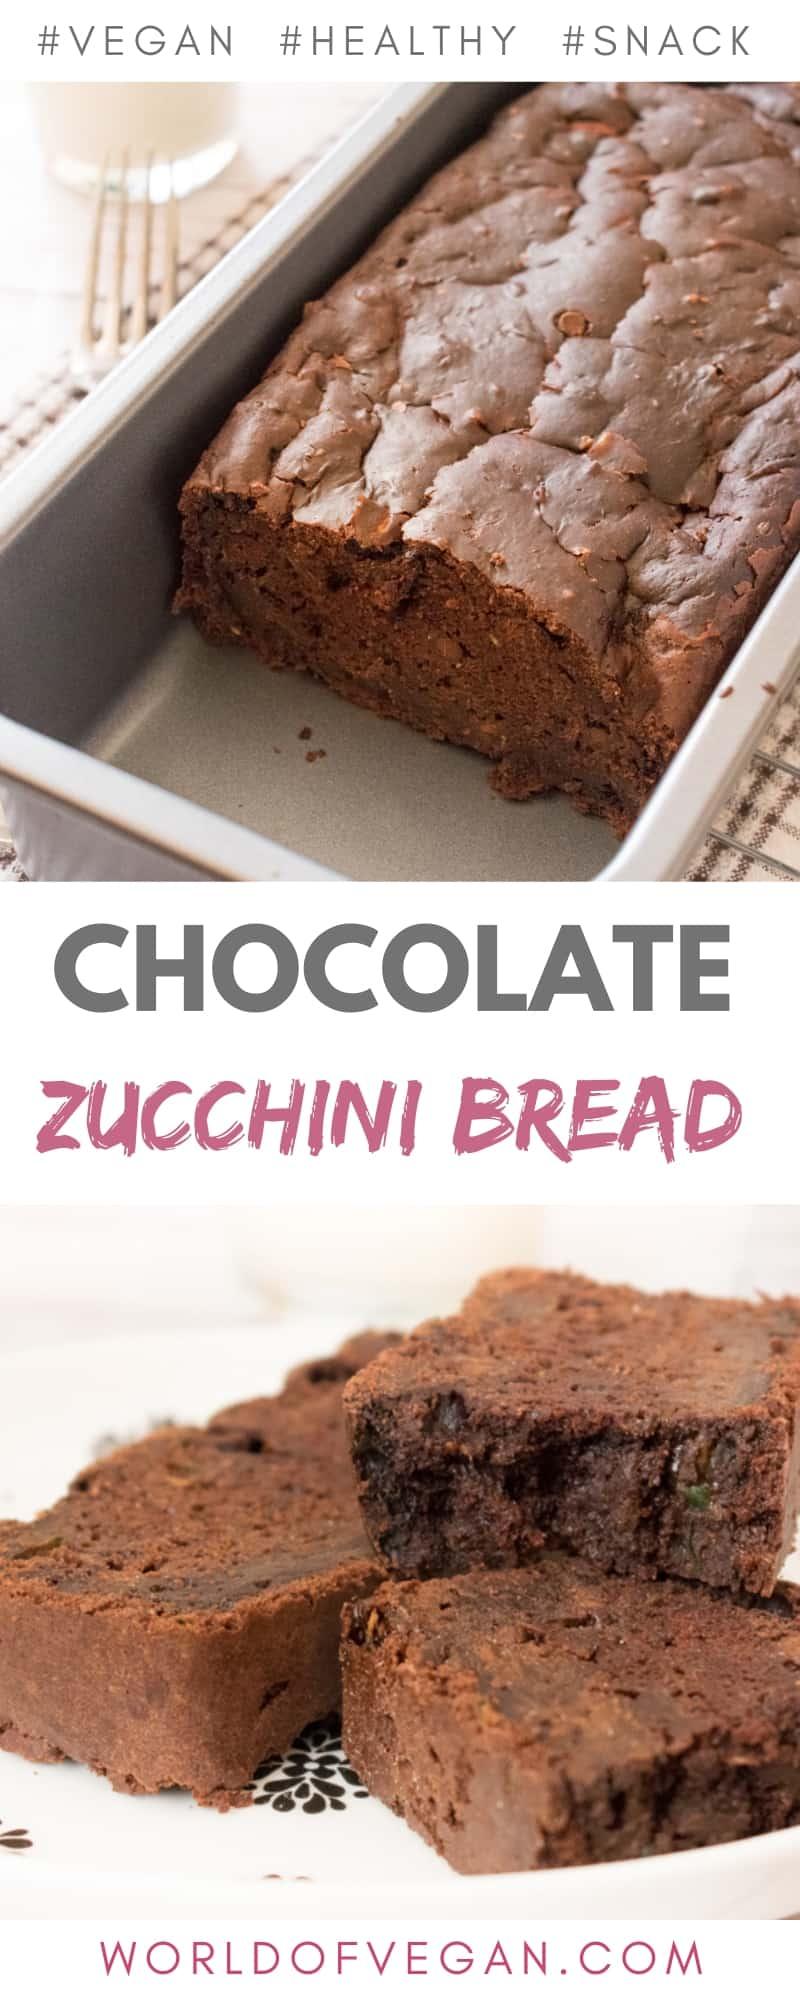 Vegan Chocolate Zucchini Bread | Easy Breakfast Recipe | #zucchini #chocolate #bread #vegan #dessert #breakfast #recipe #worldofvegan